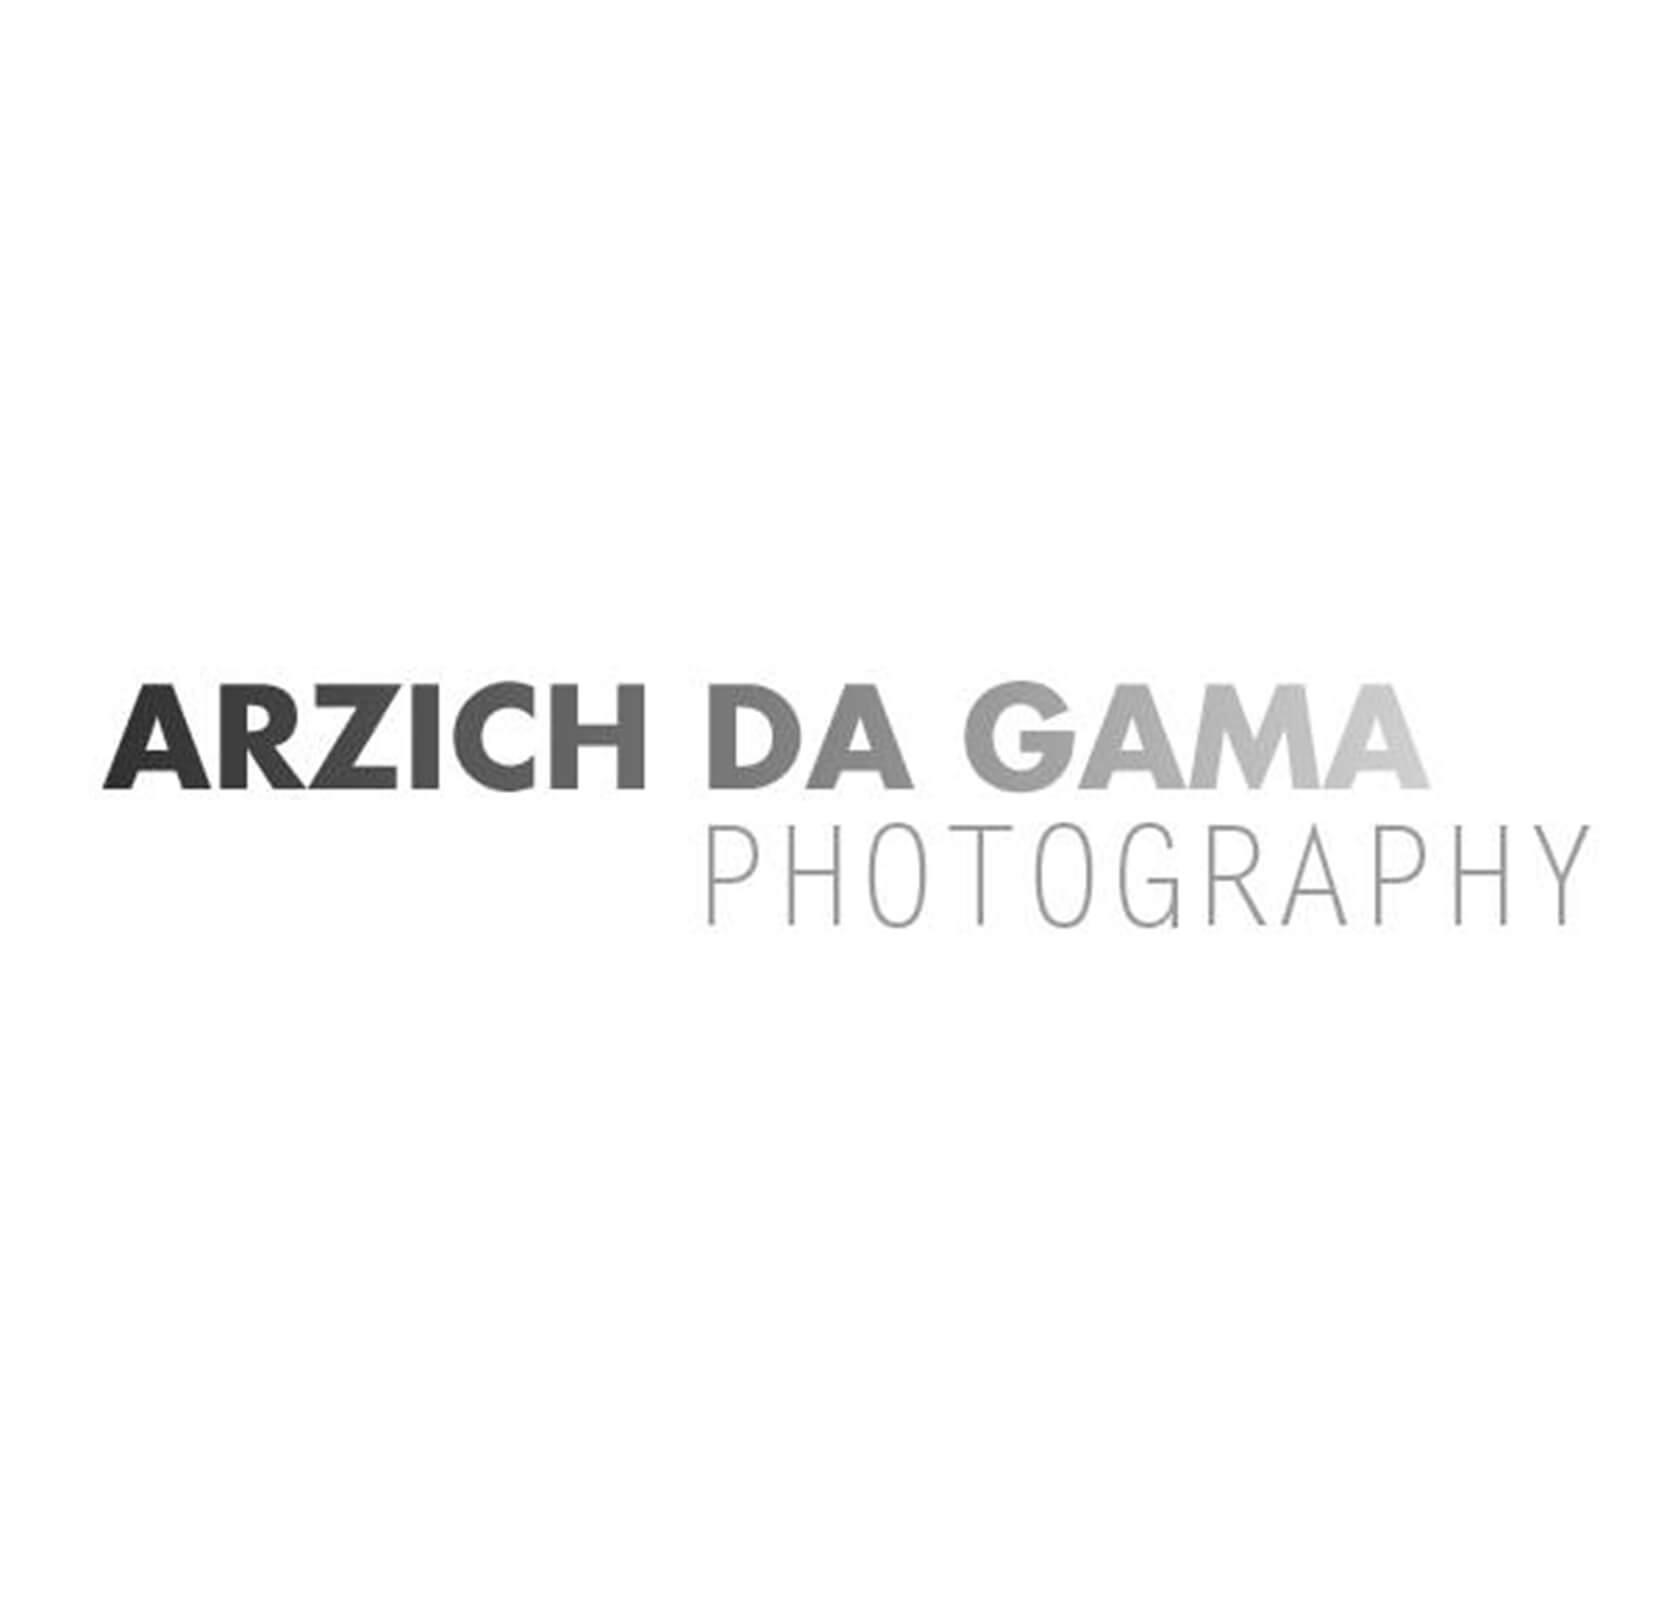 Arzich da Gama Photography